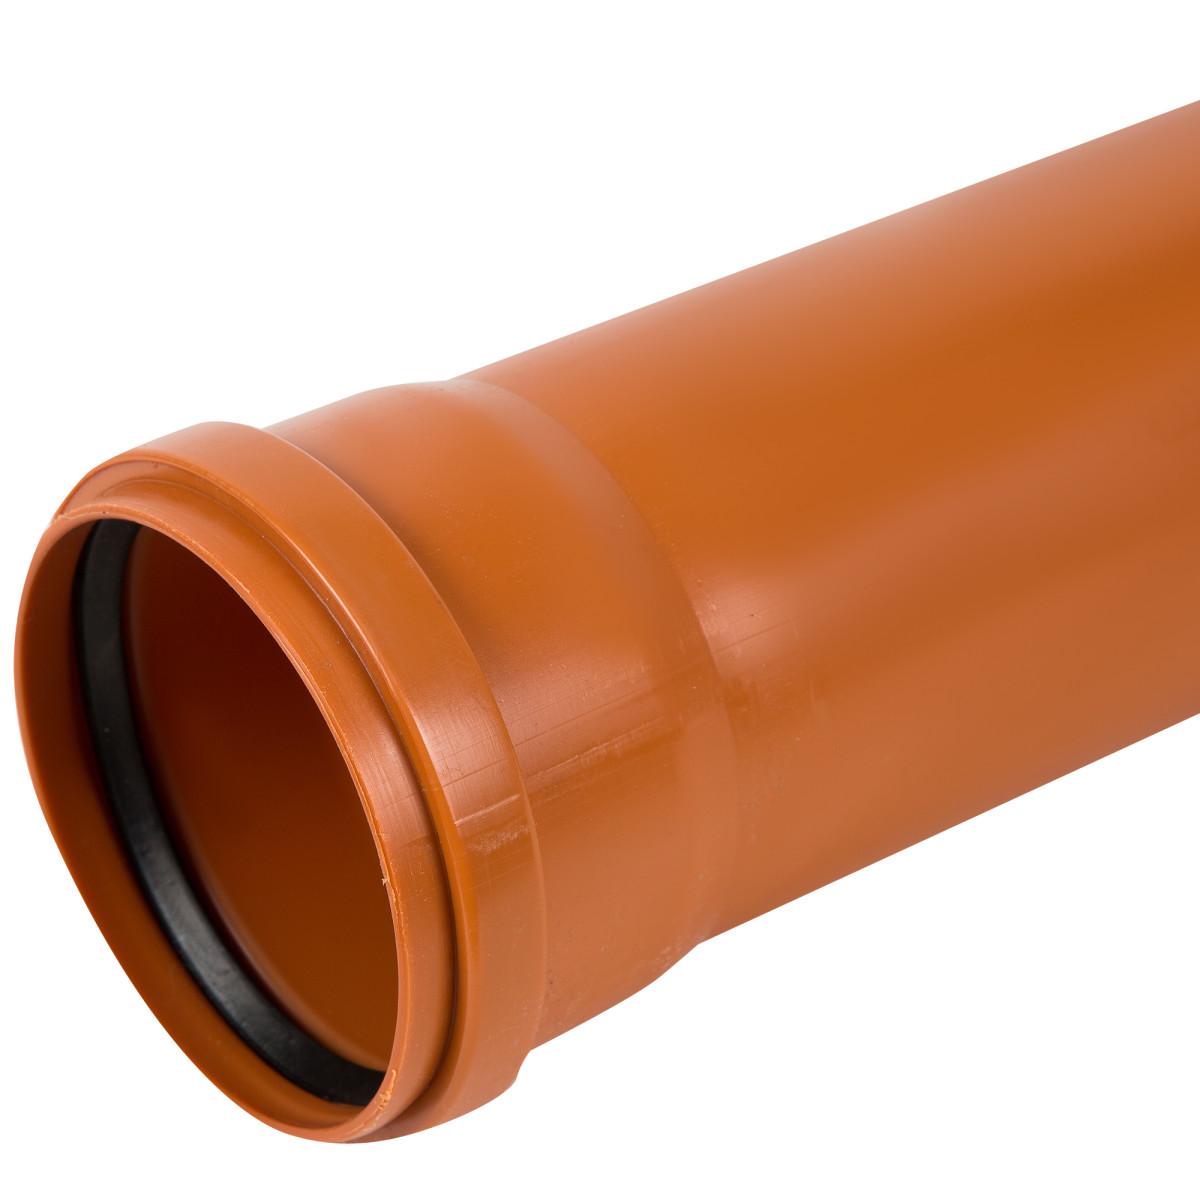 Труба раструбная наружная Пиарком SN2 110x2000 мм